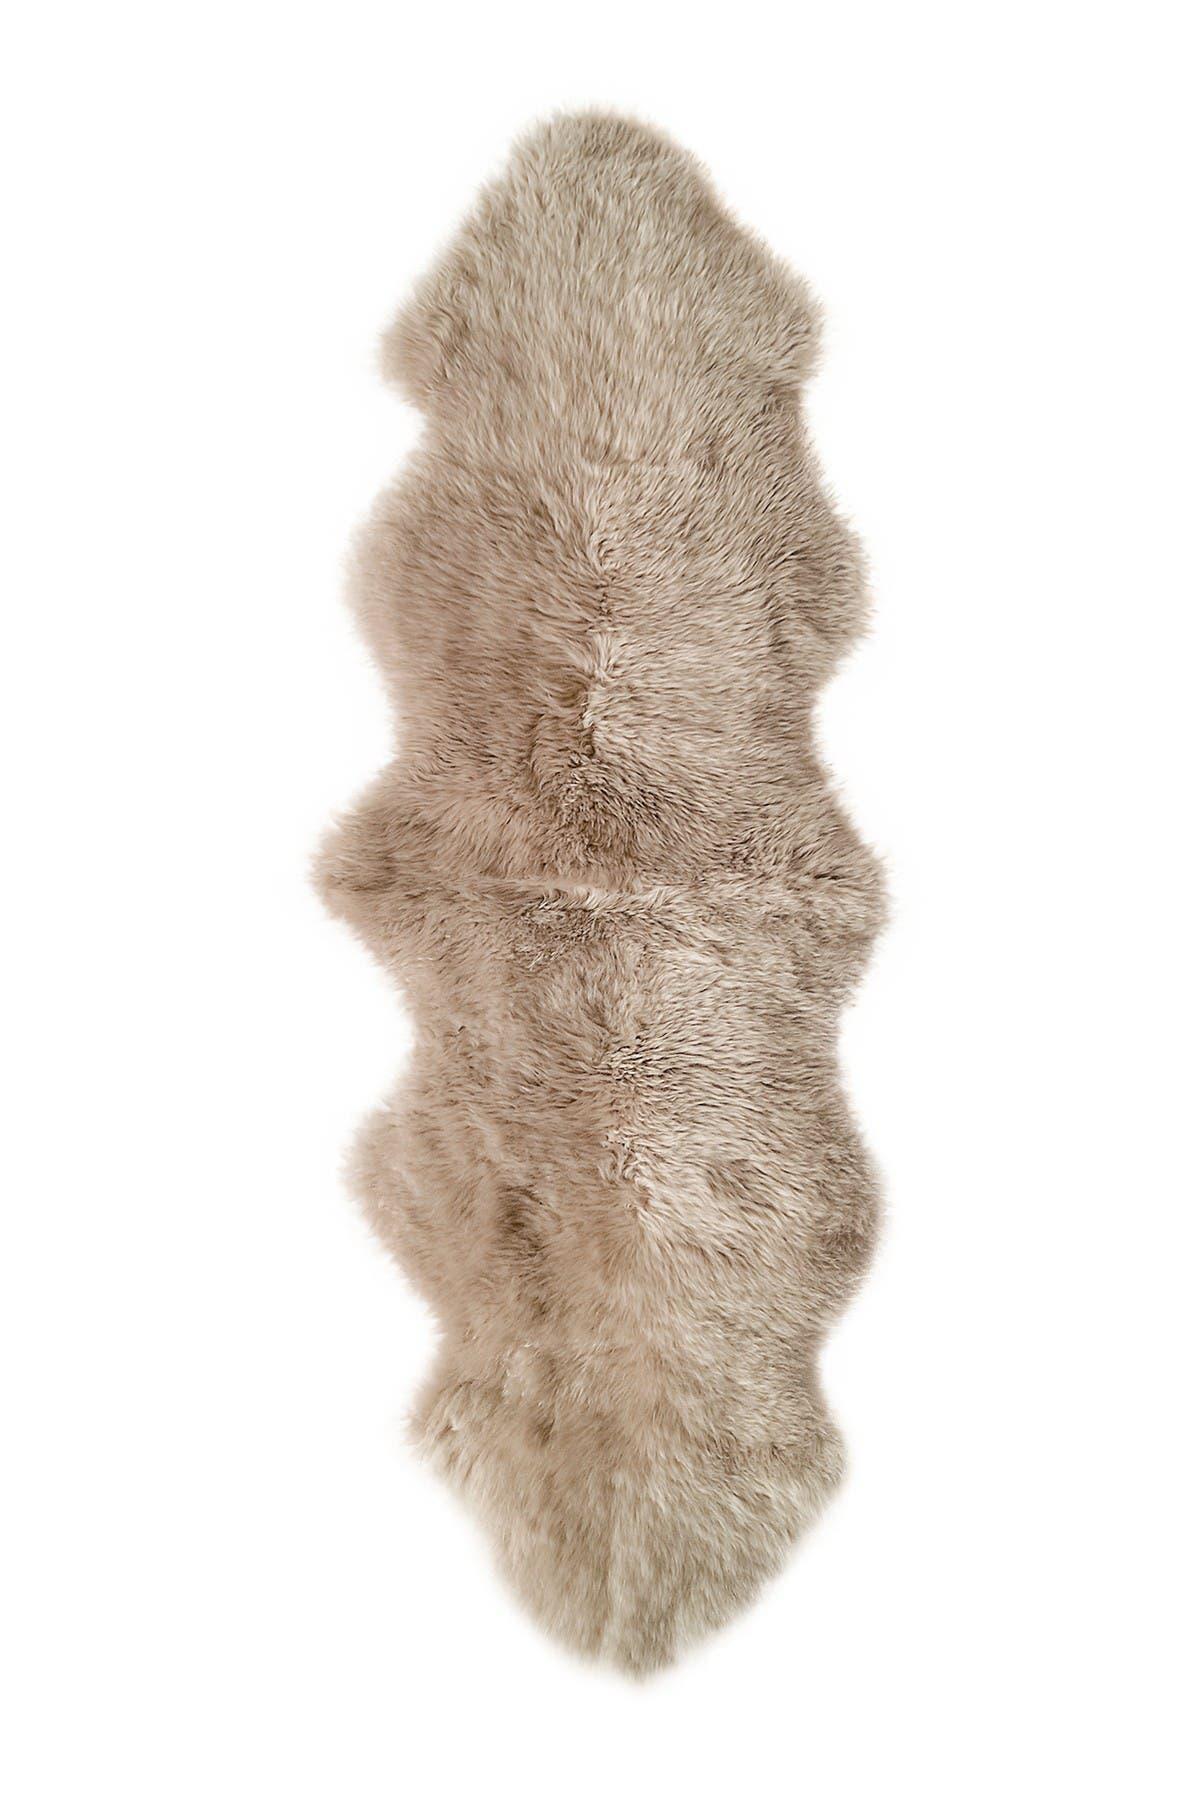 Image of Kinetic New Zealand Genuine Sheepskin Throw - 2ft x 6ft - Taupe